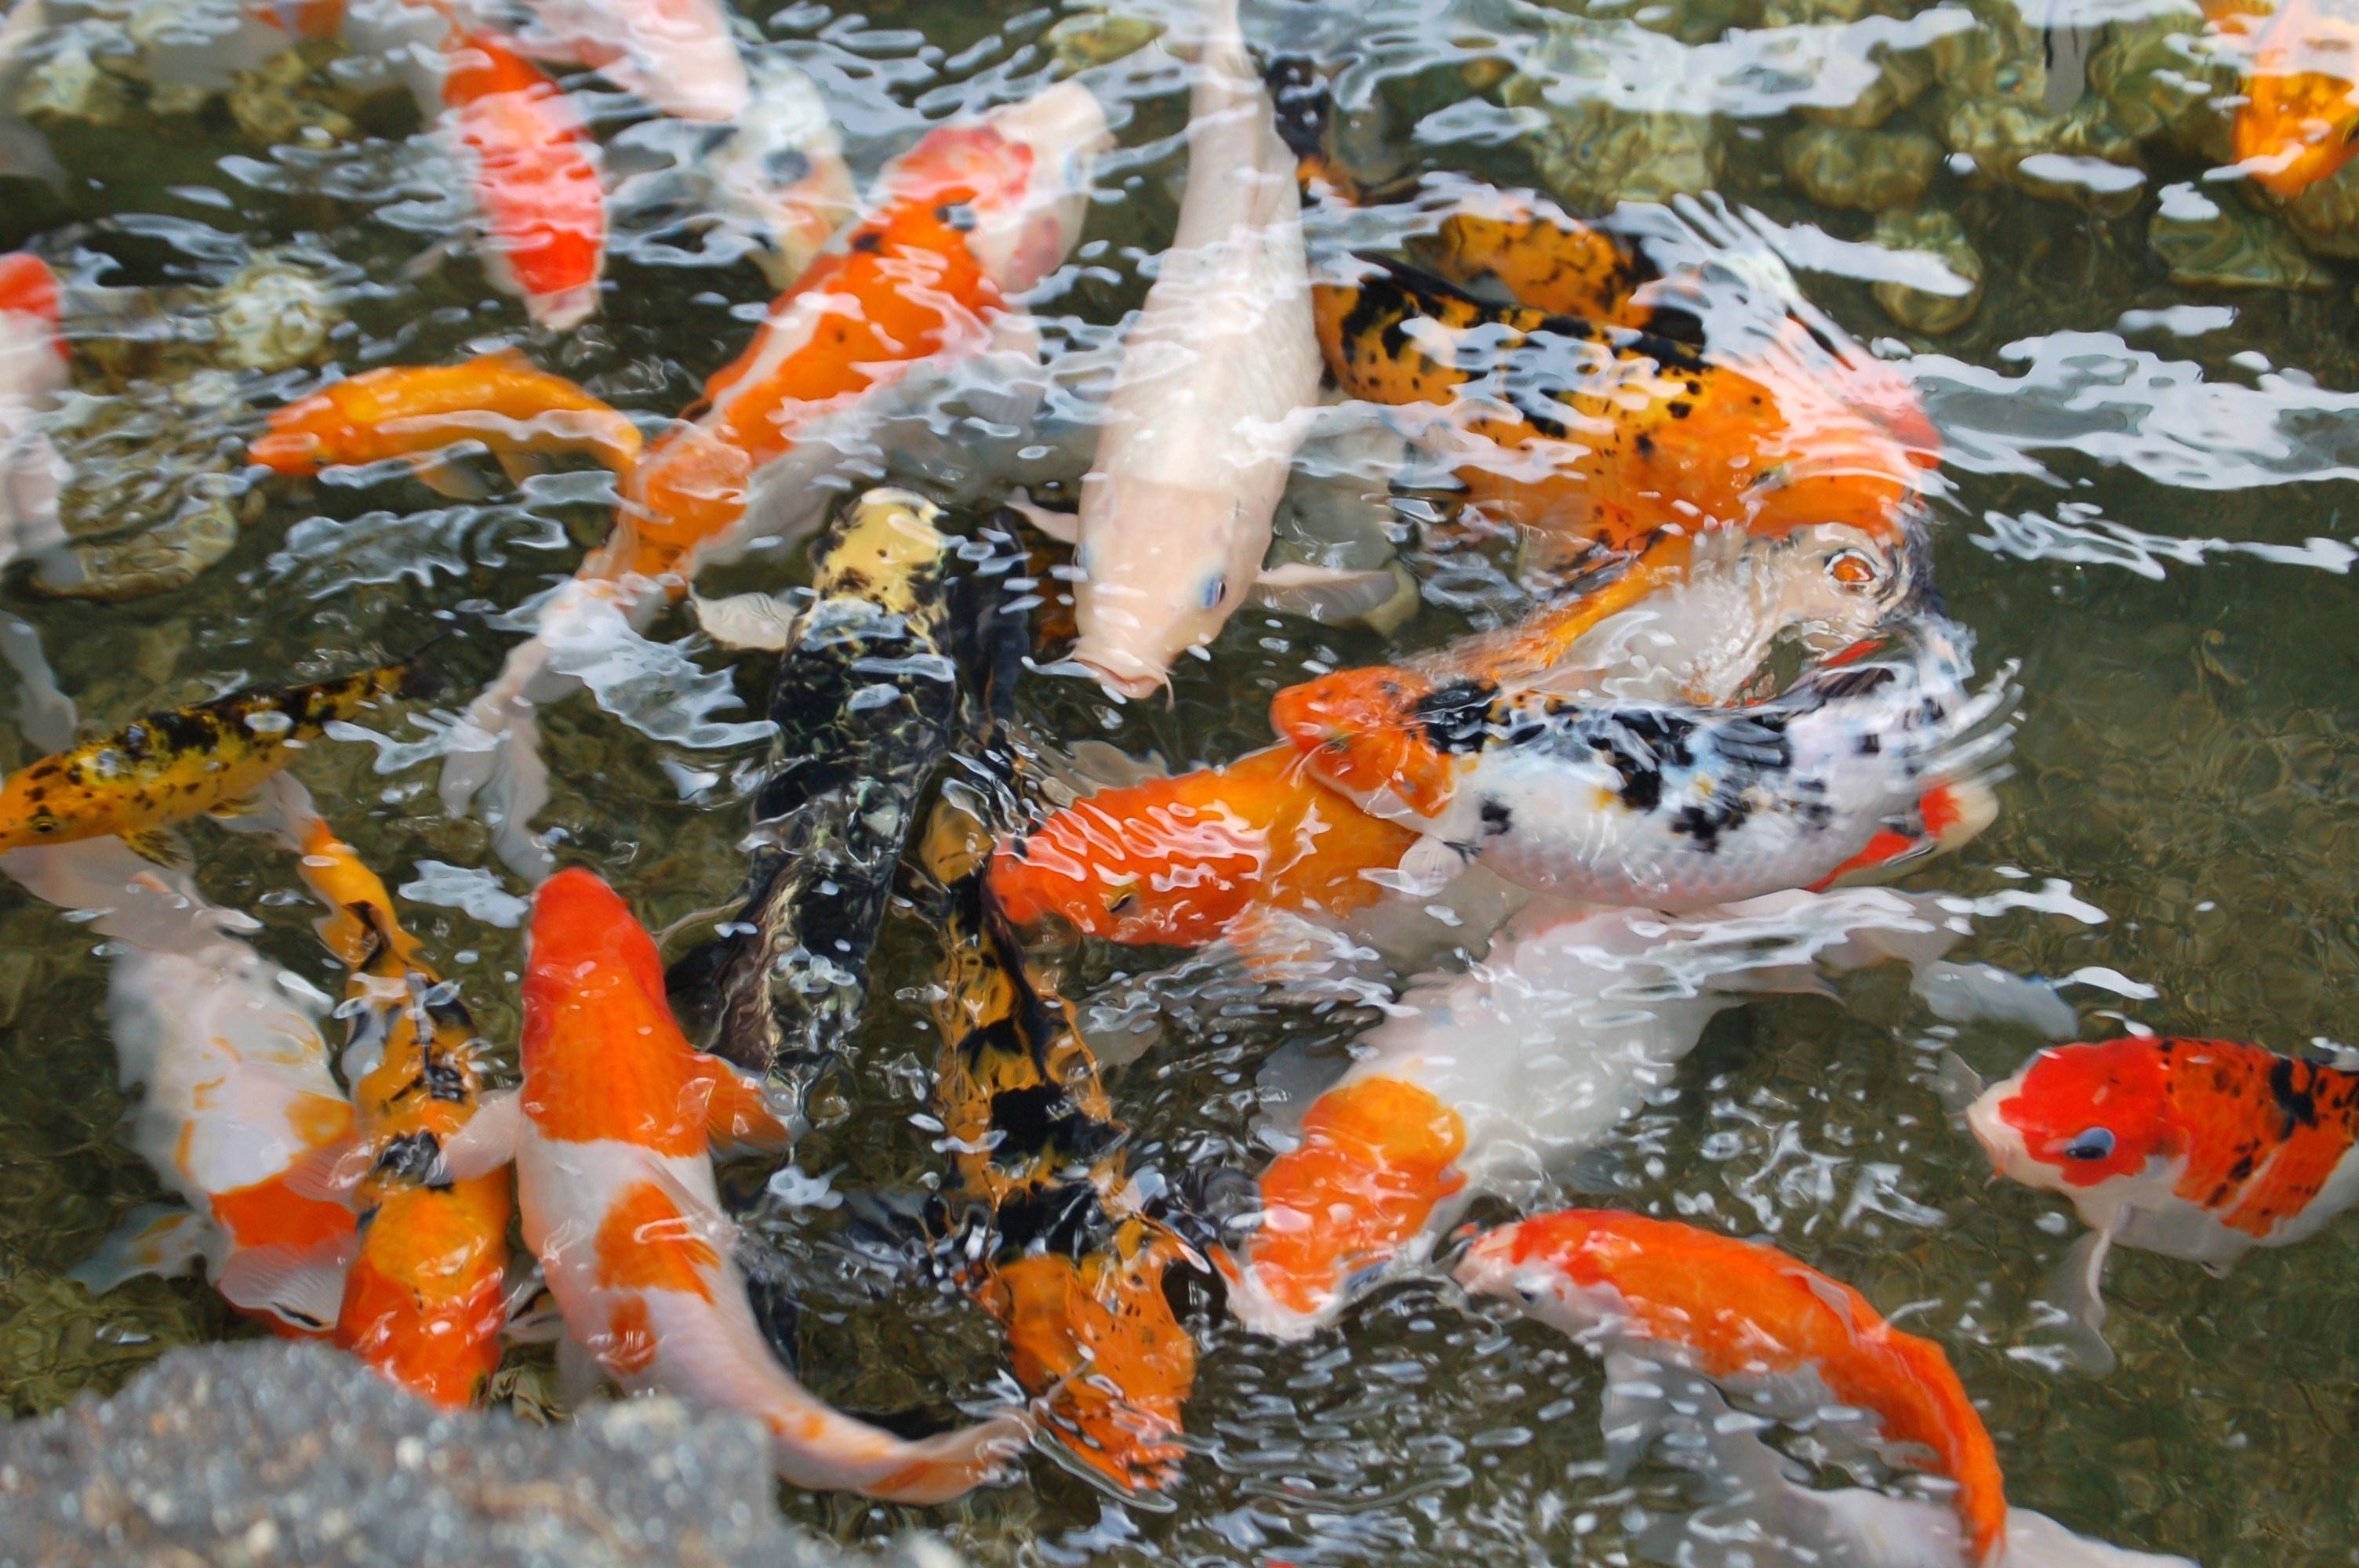 Free images water underwater animals goldfish fish for Koi fish in pool